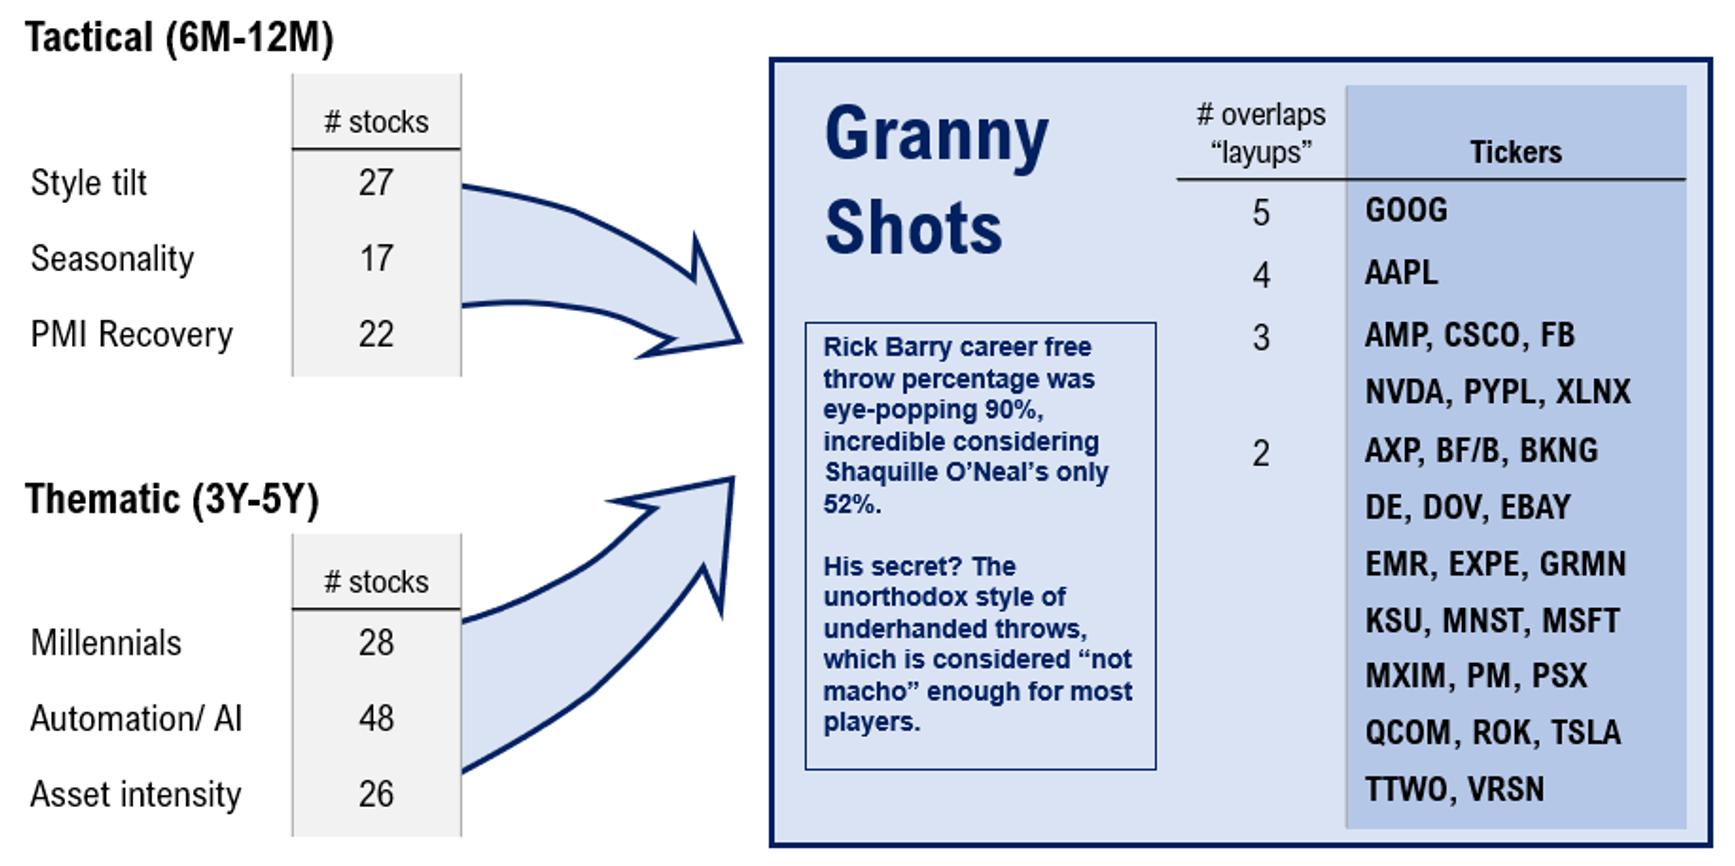 202005231 2 GRANNY SHOTS: Best bets in 2020   Week 21